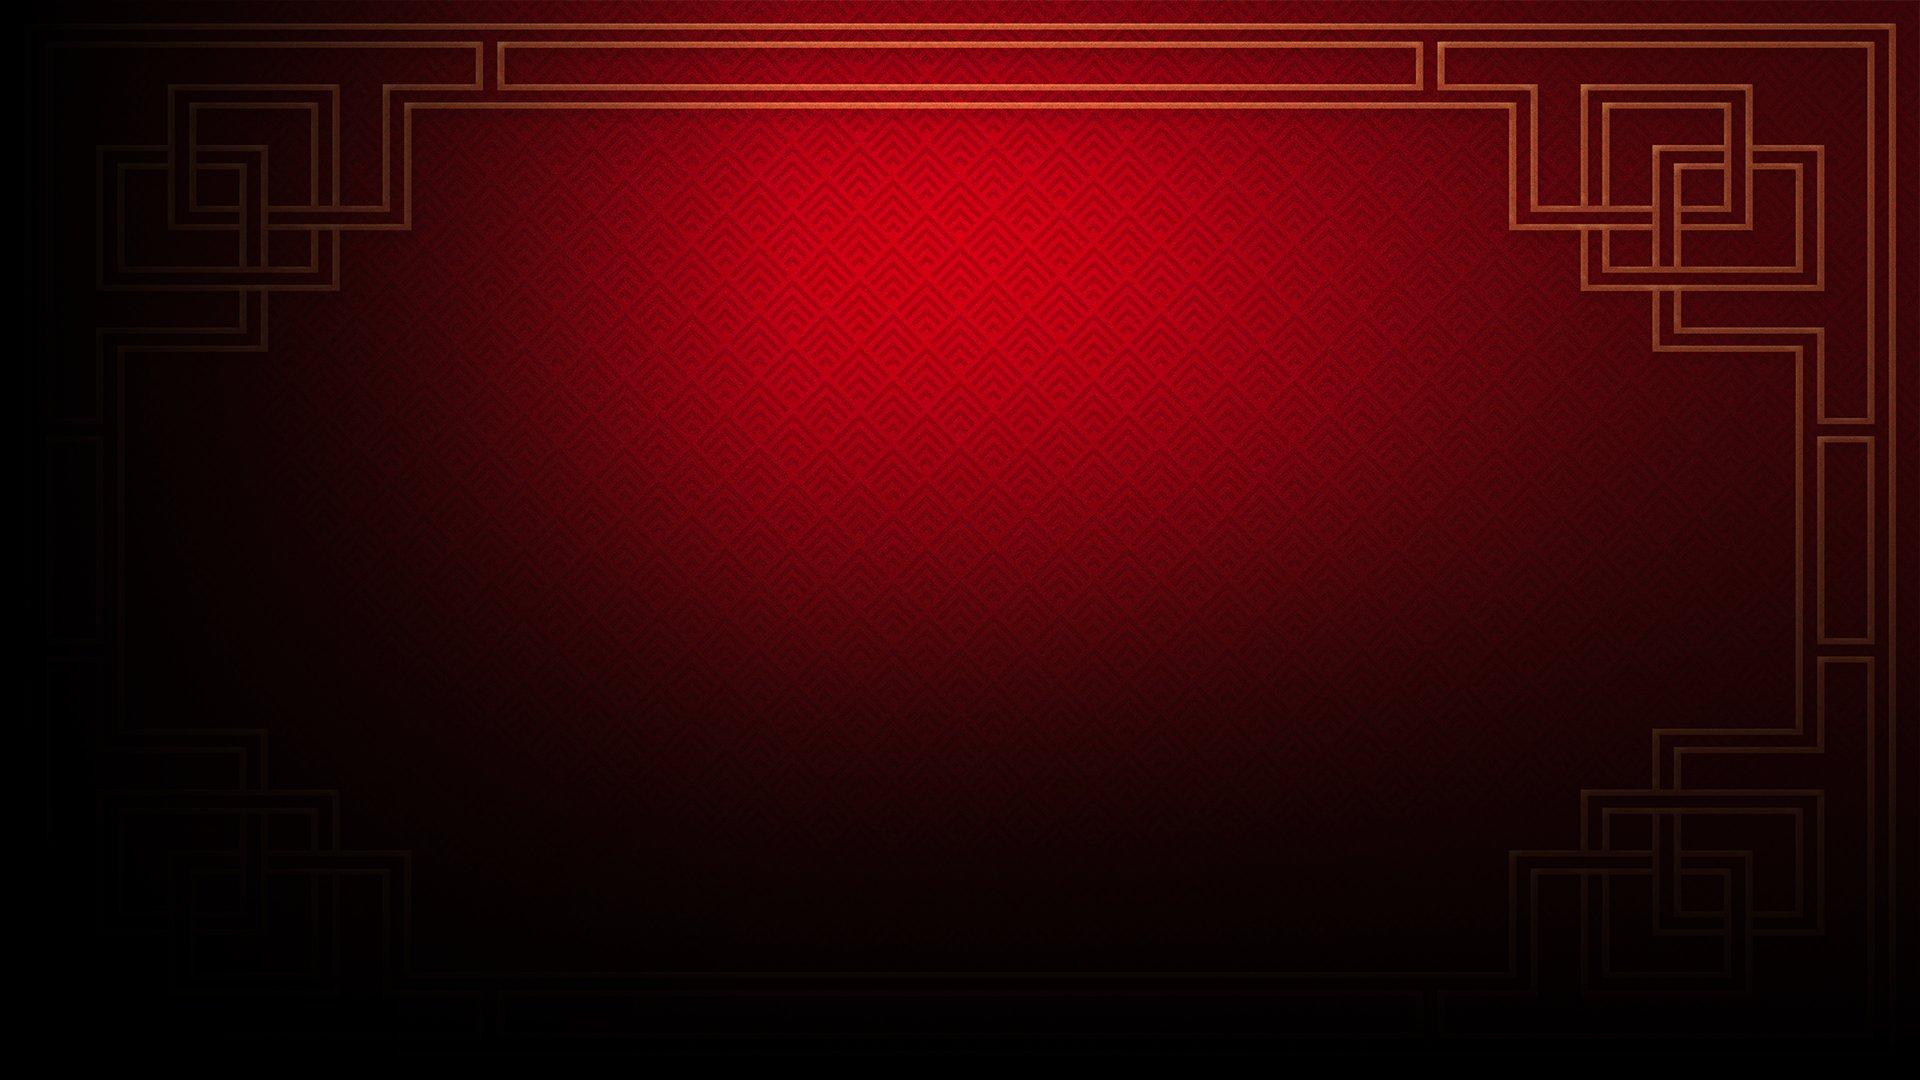 fond Hercule Poirot - S05 E08 - Vol de bijoux à l'hotel Metropolitan